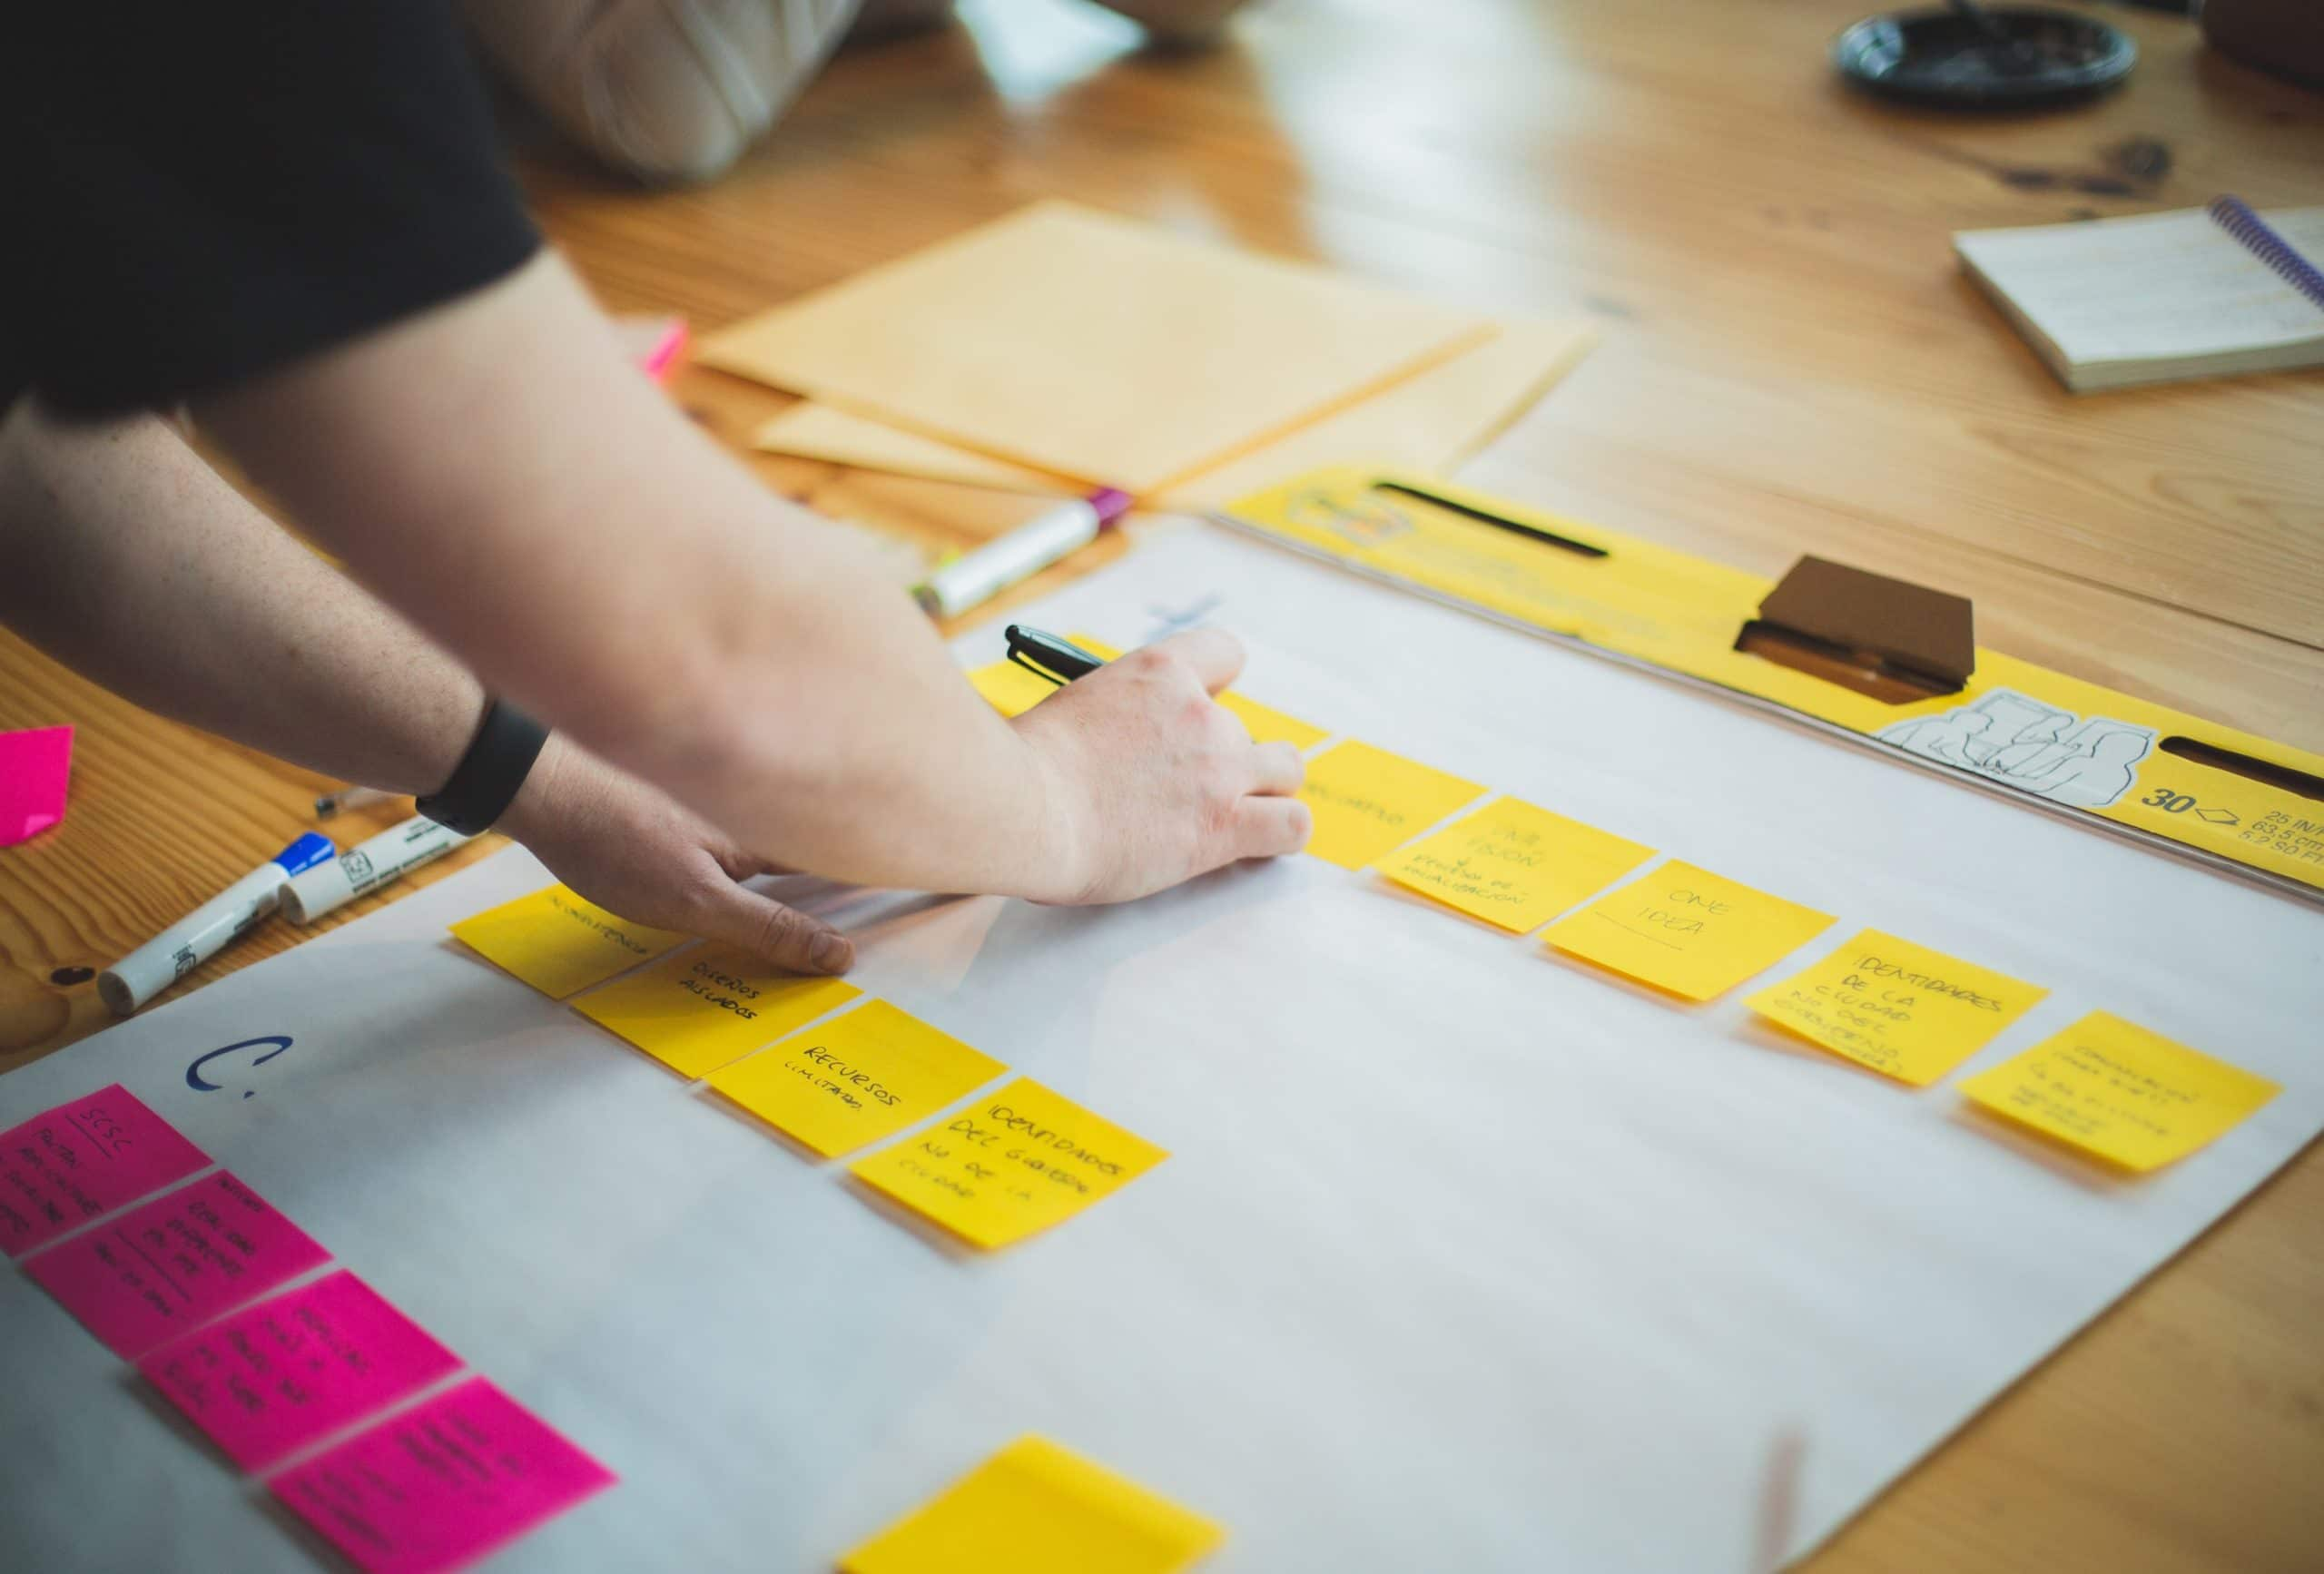 Design Thinking Magdeburg - Kreative Ideen in Magdeburg und Umgebung